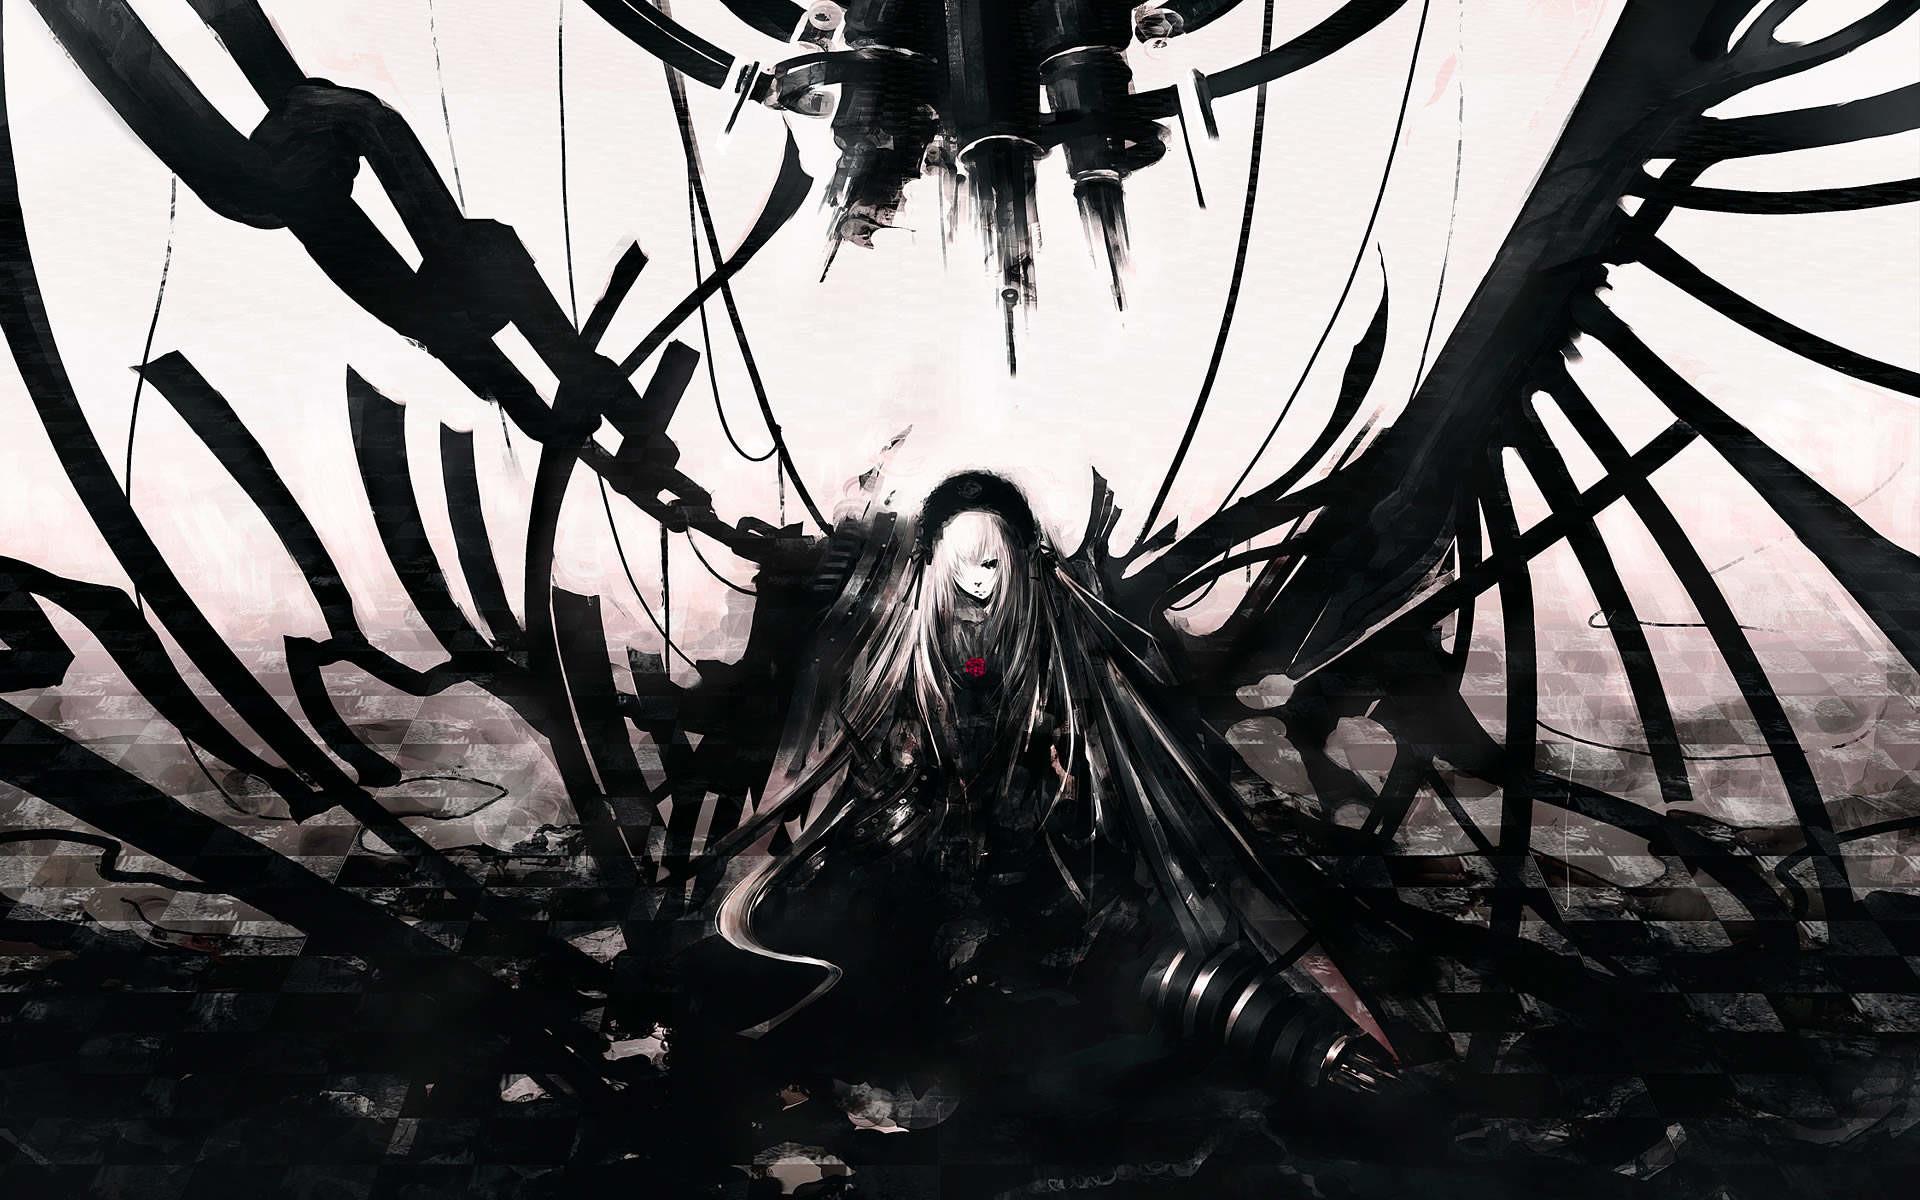 Dark Anime Desktop Wallpaper 6296